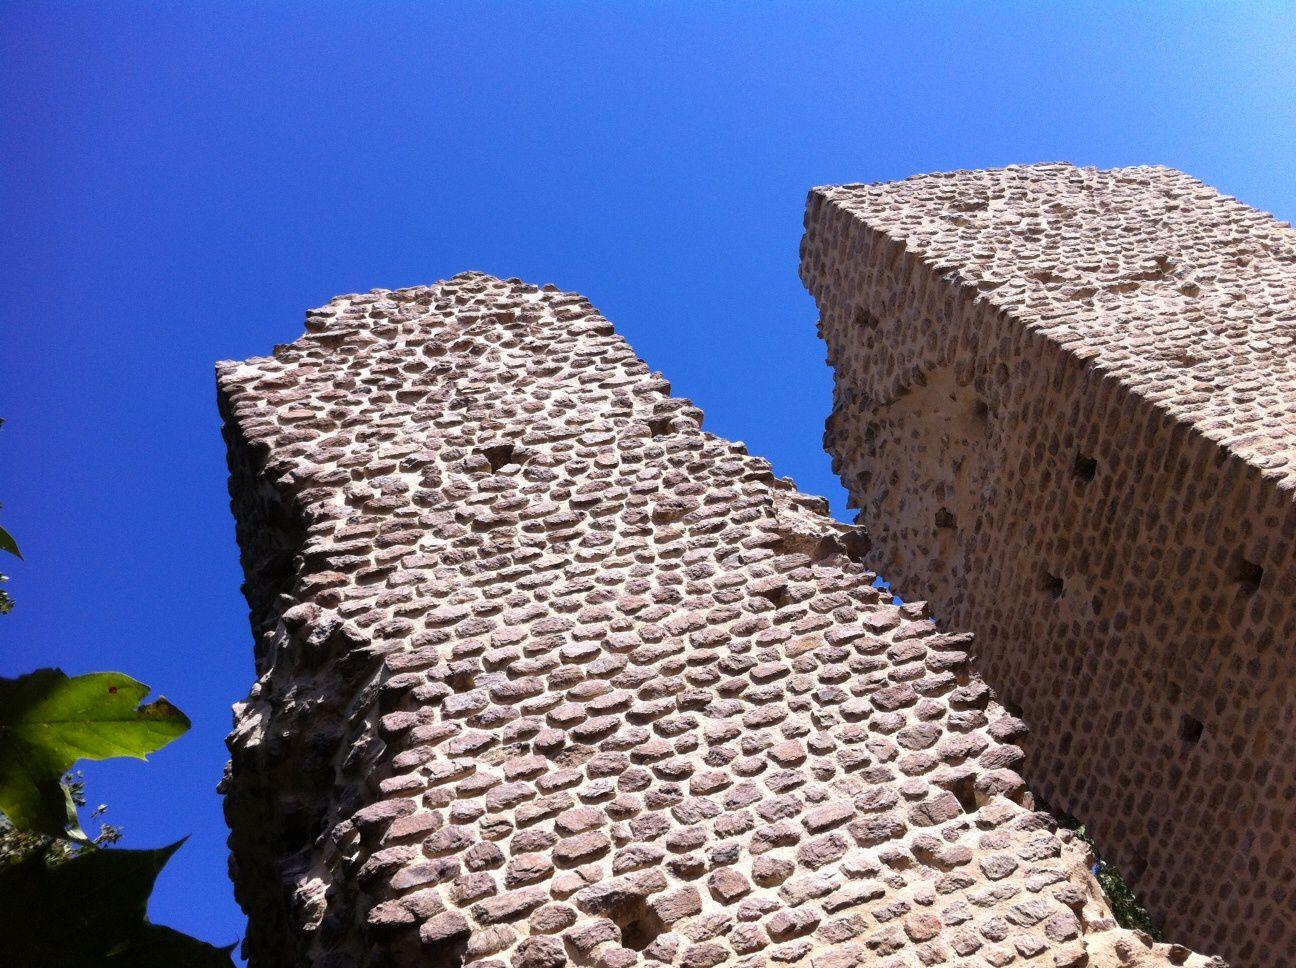 Les piles de l'Aqueduc romain retrouvent de l'éclat